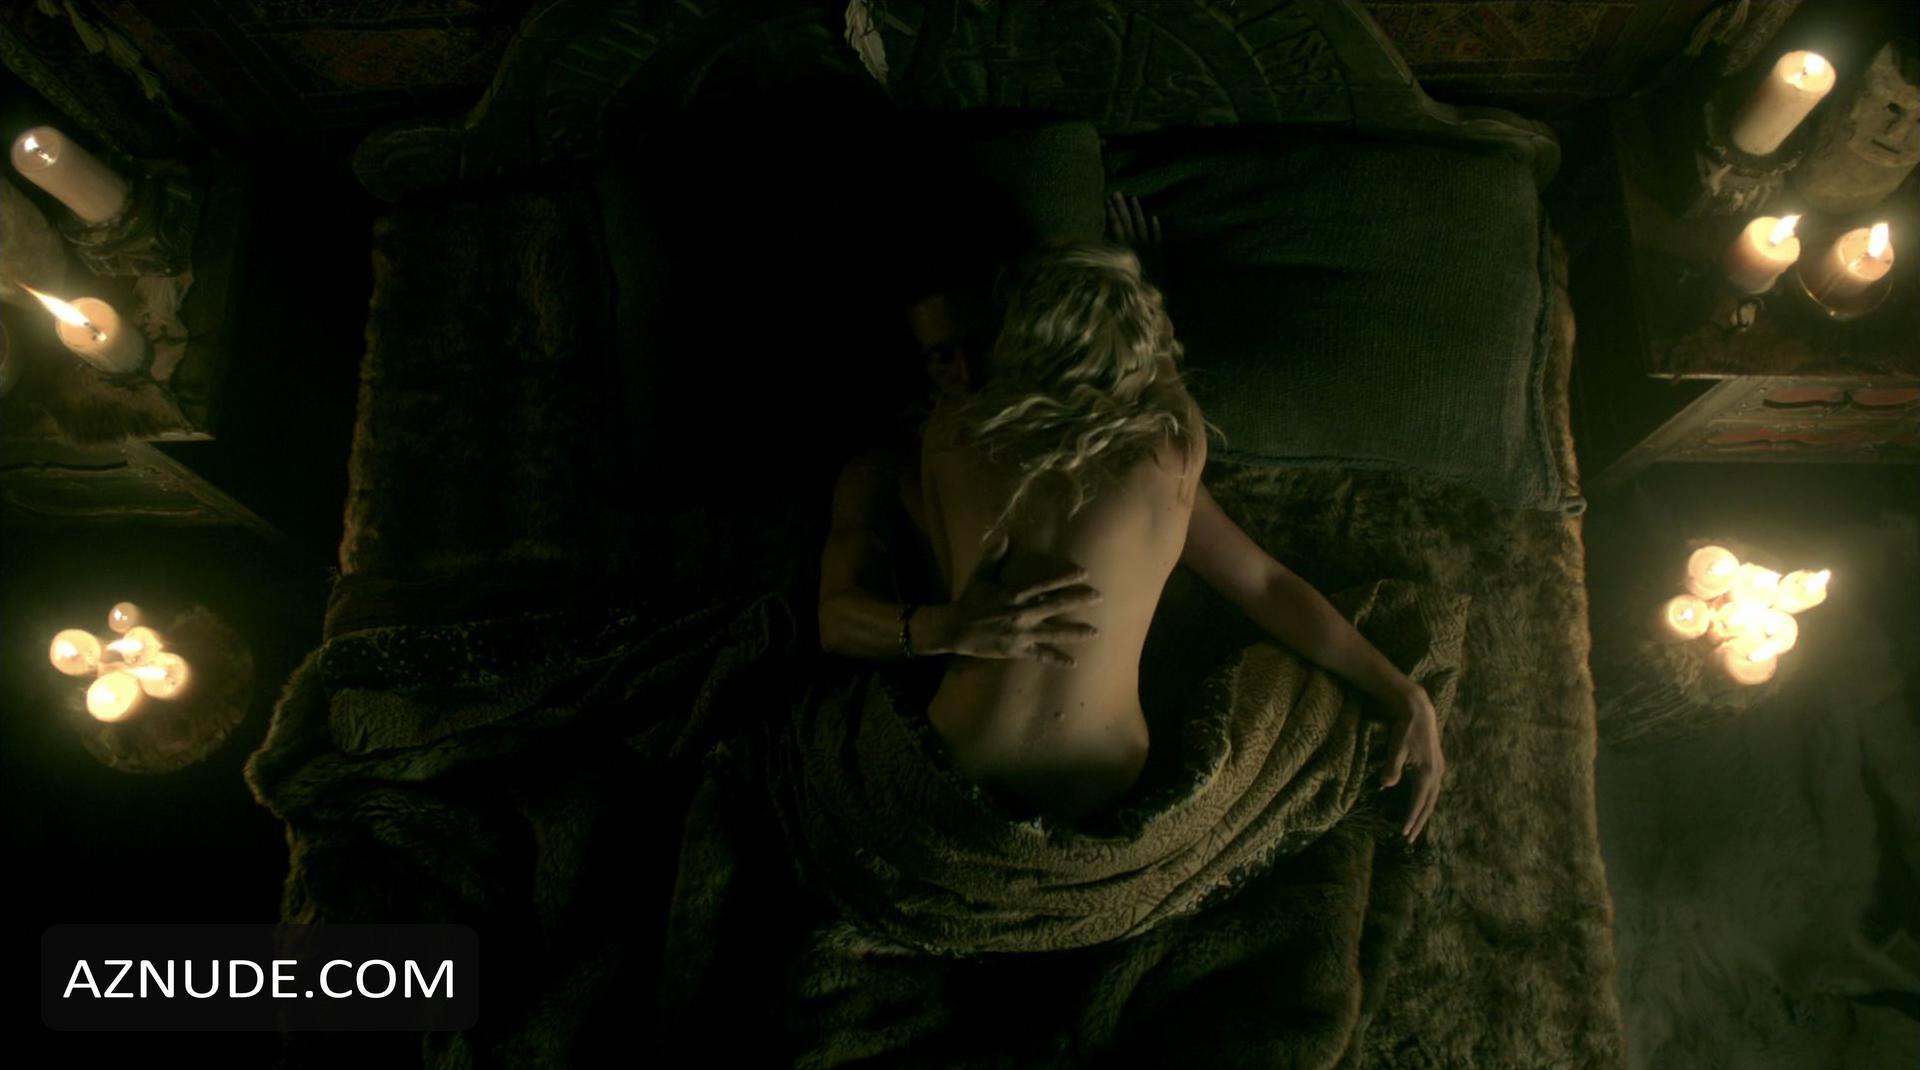 Ida marie nielsen nackt